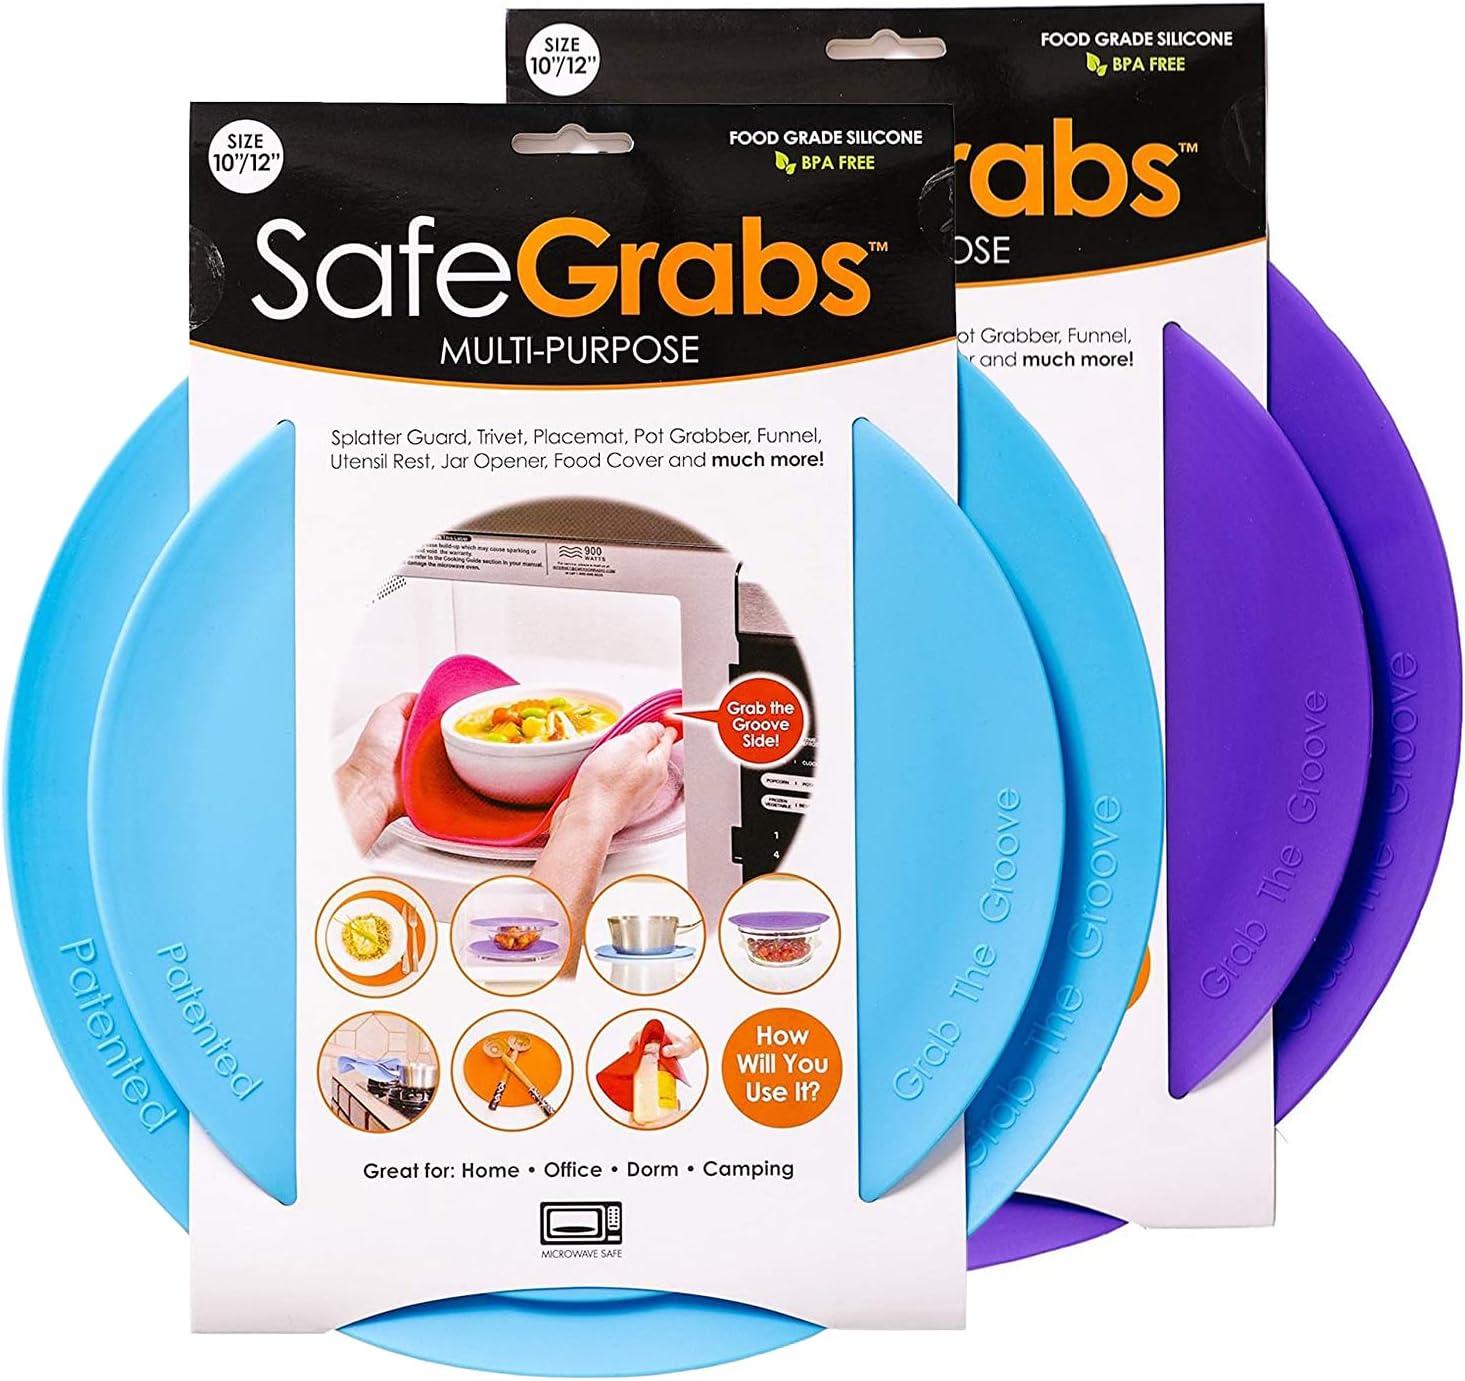 Safe High quality new Grabs 2 Color Bundle: Silicone Original Micro Multi-Purpose Dedication